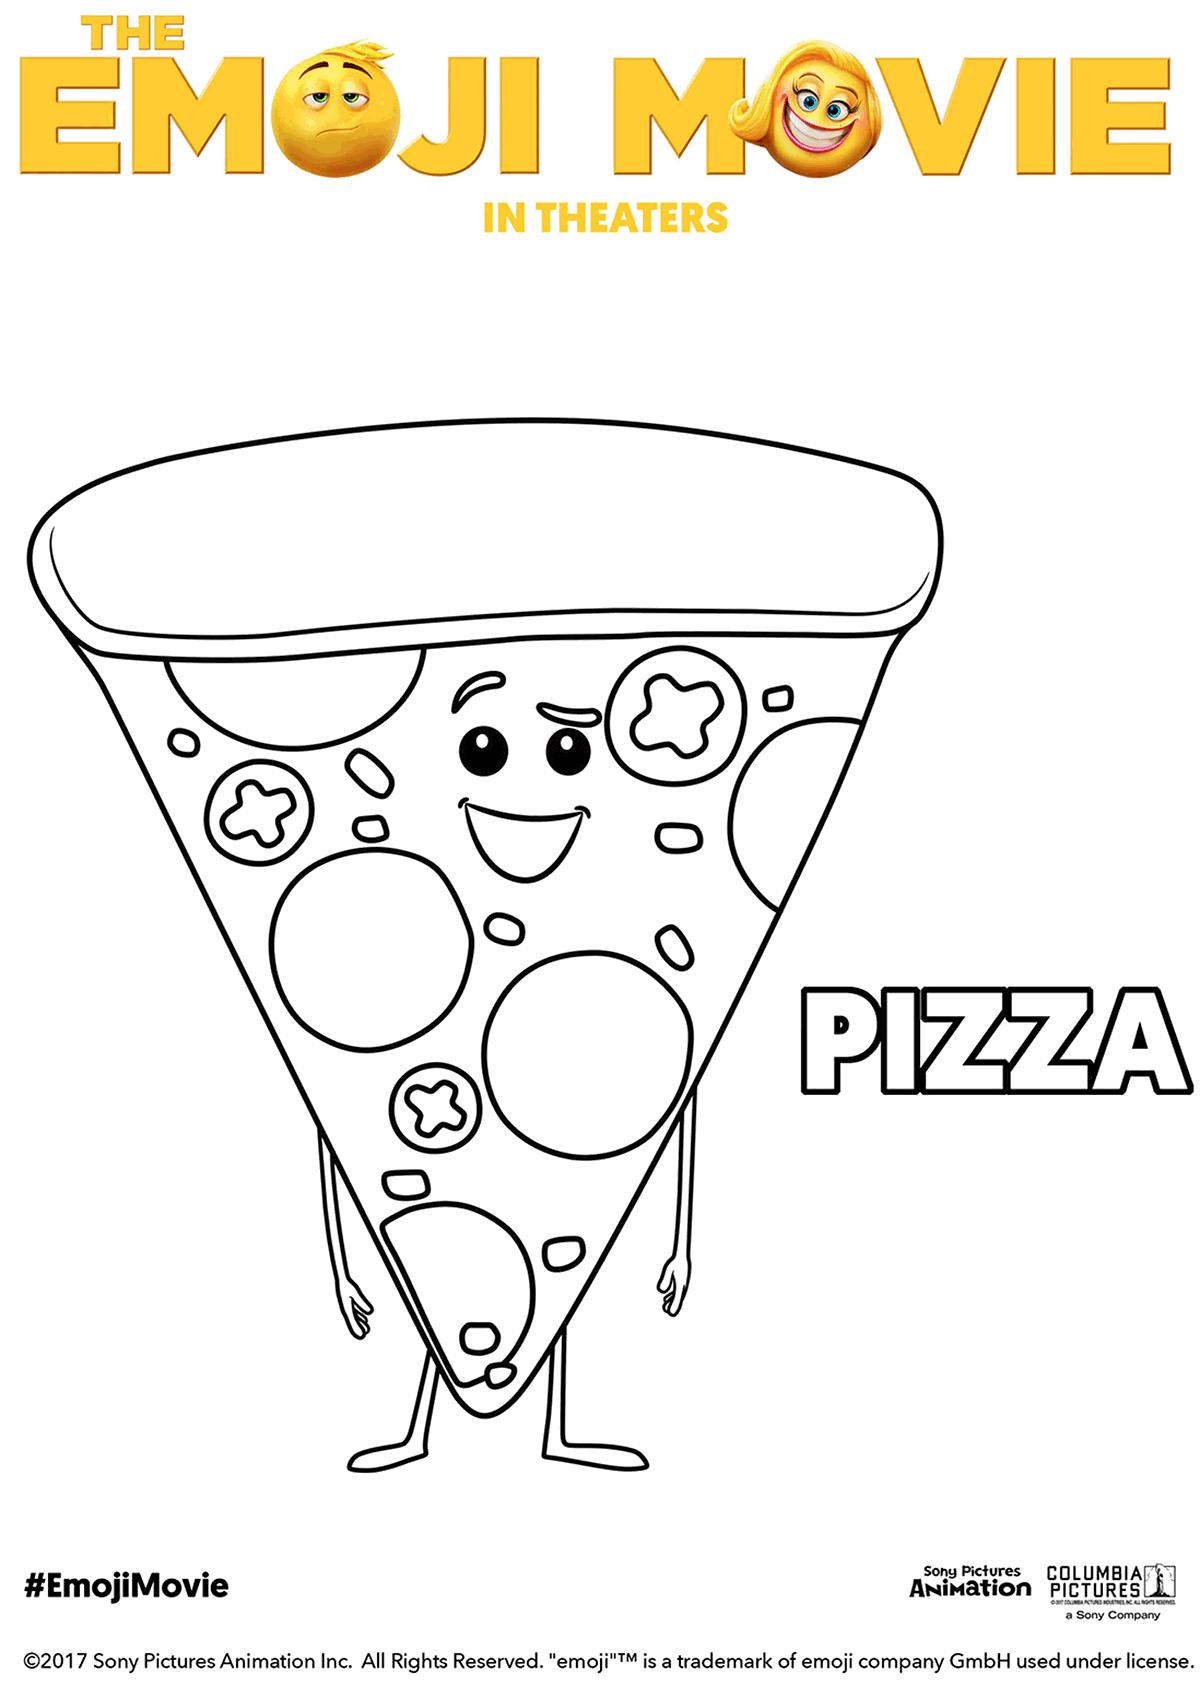 The Emoji Movie Pizza Coloring Page Emoji Movie Emoji Coloring Pages Coloring Pages